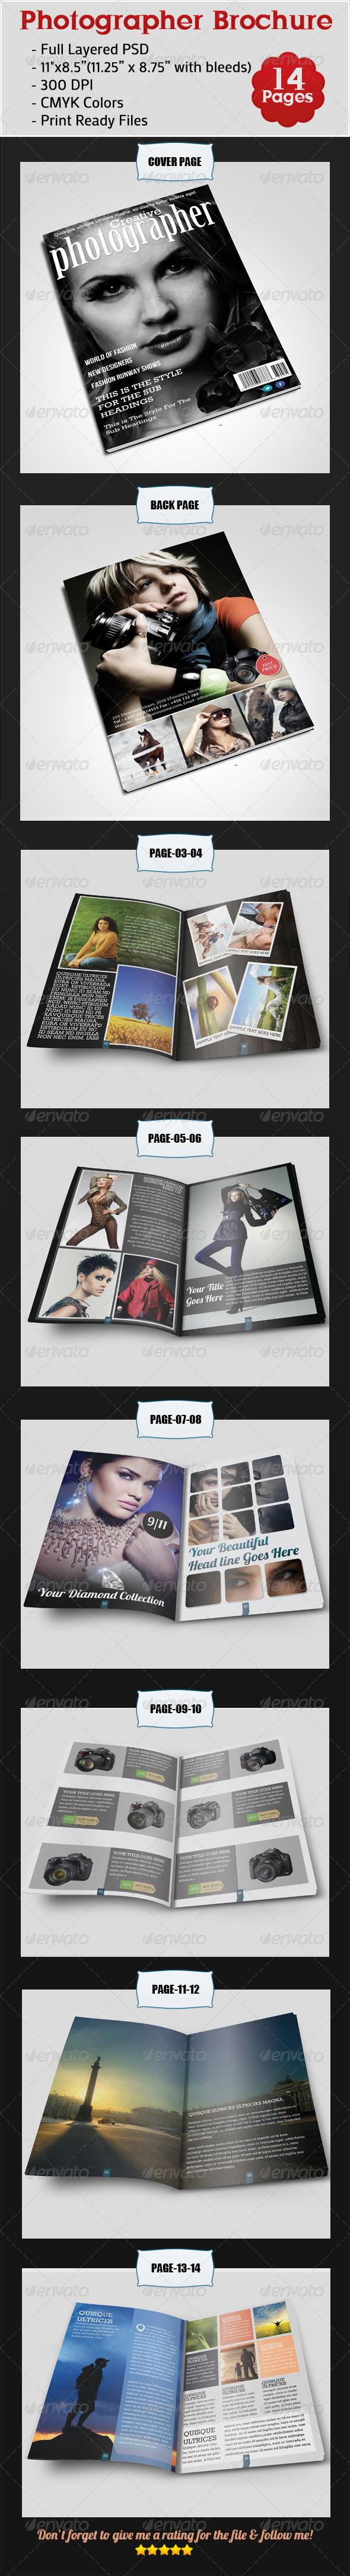 GraphicRiver Photographer Brochure 4172155